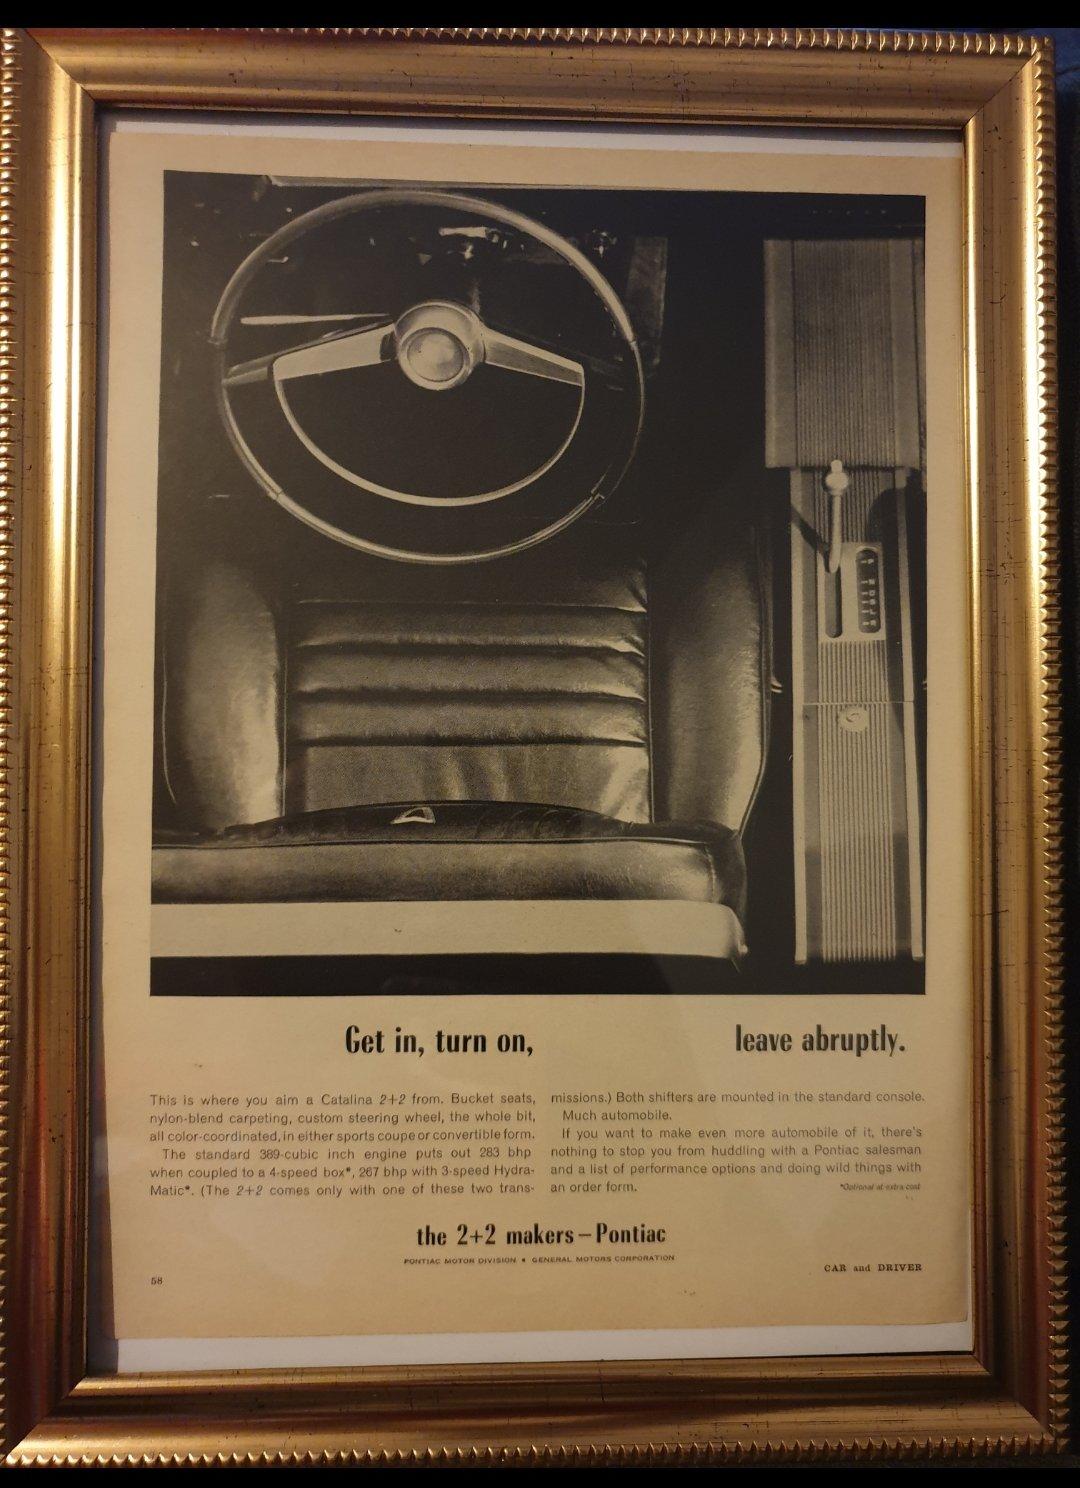 1964 Pontiac Catalina Advert Original  For Sale (picture 1 of 2)